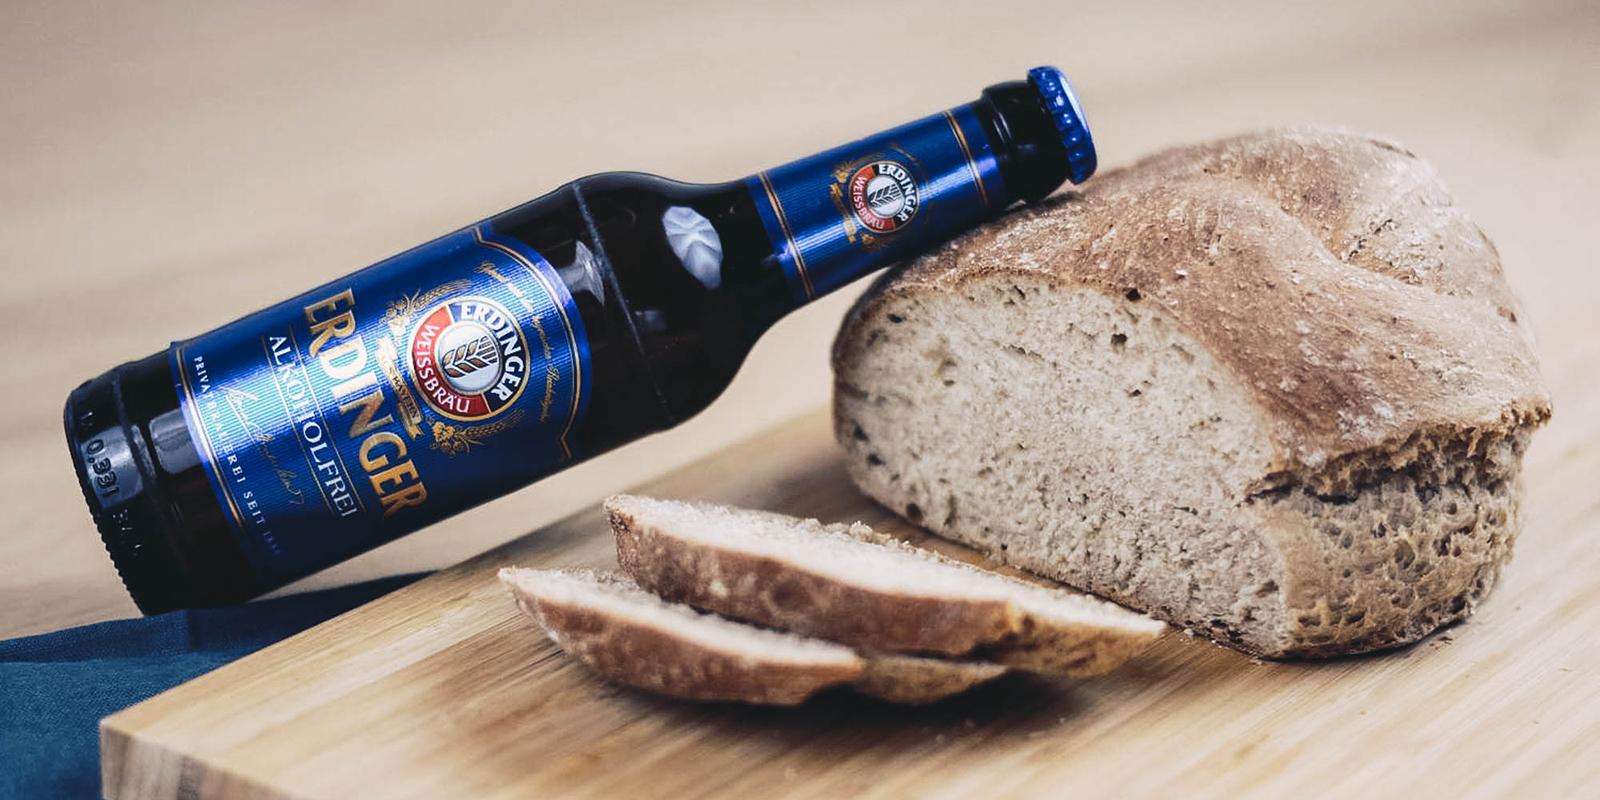 Bierbrot – Brot backen mit Erdinger Alkoholfrei